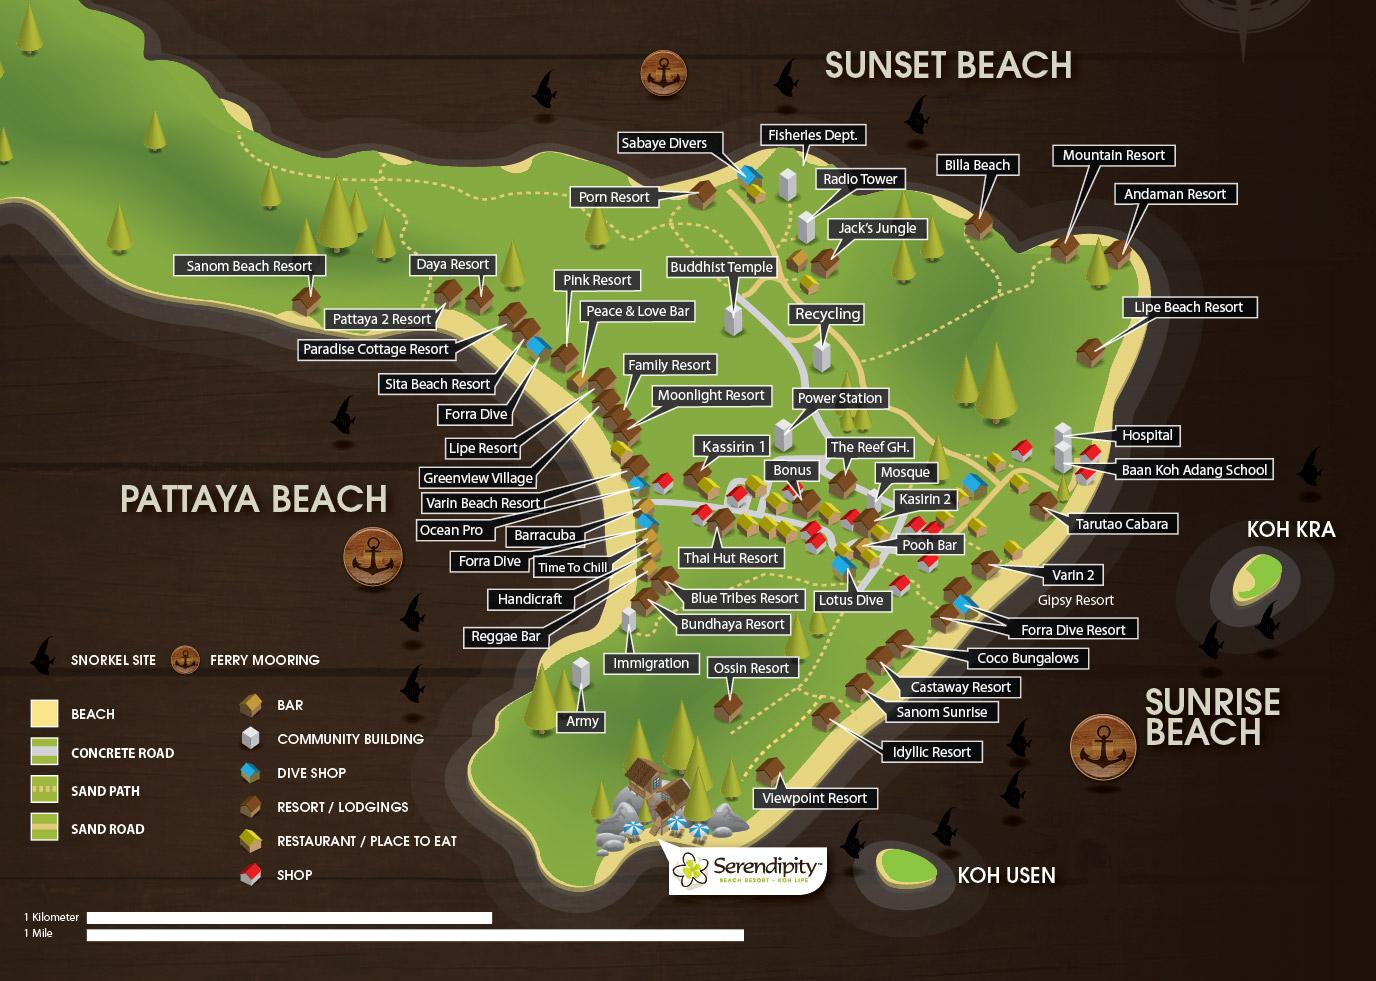 Bamboo garden rooms at lipe beach resort koh lipe - Credit